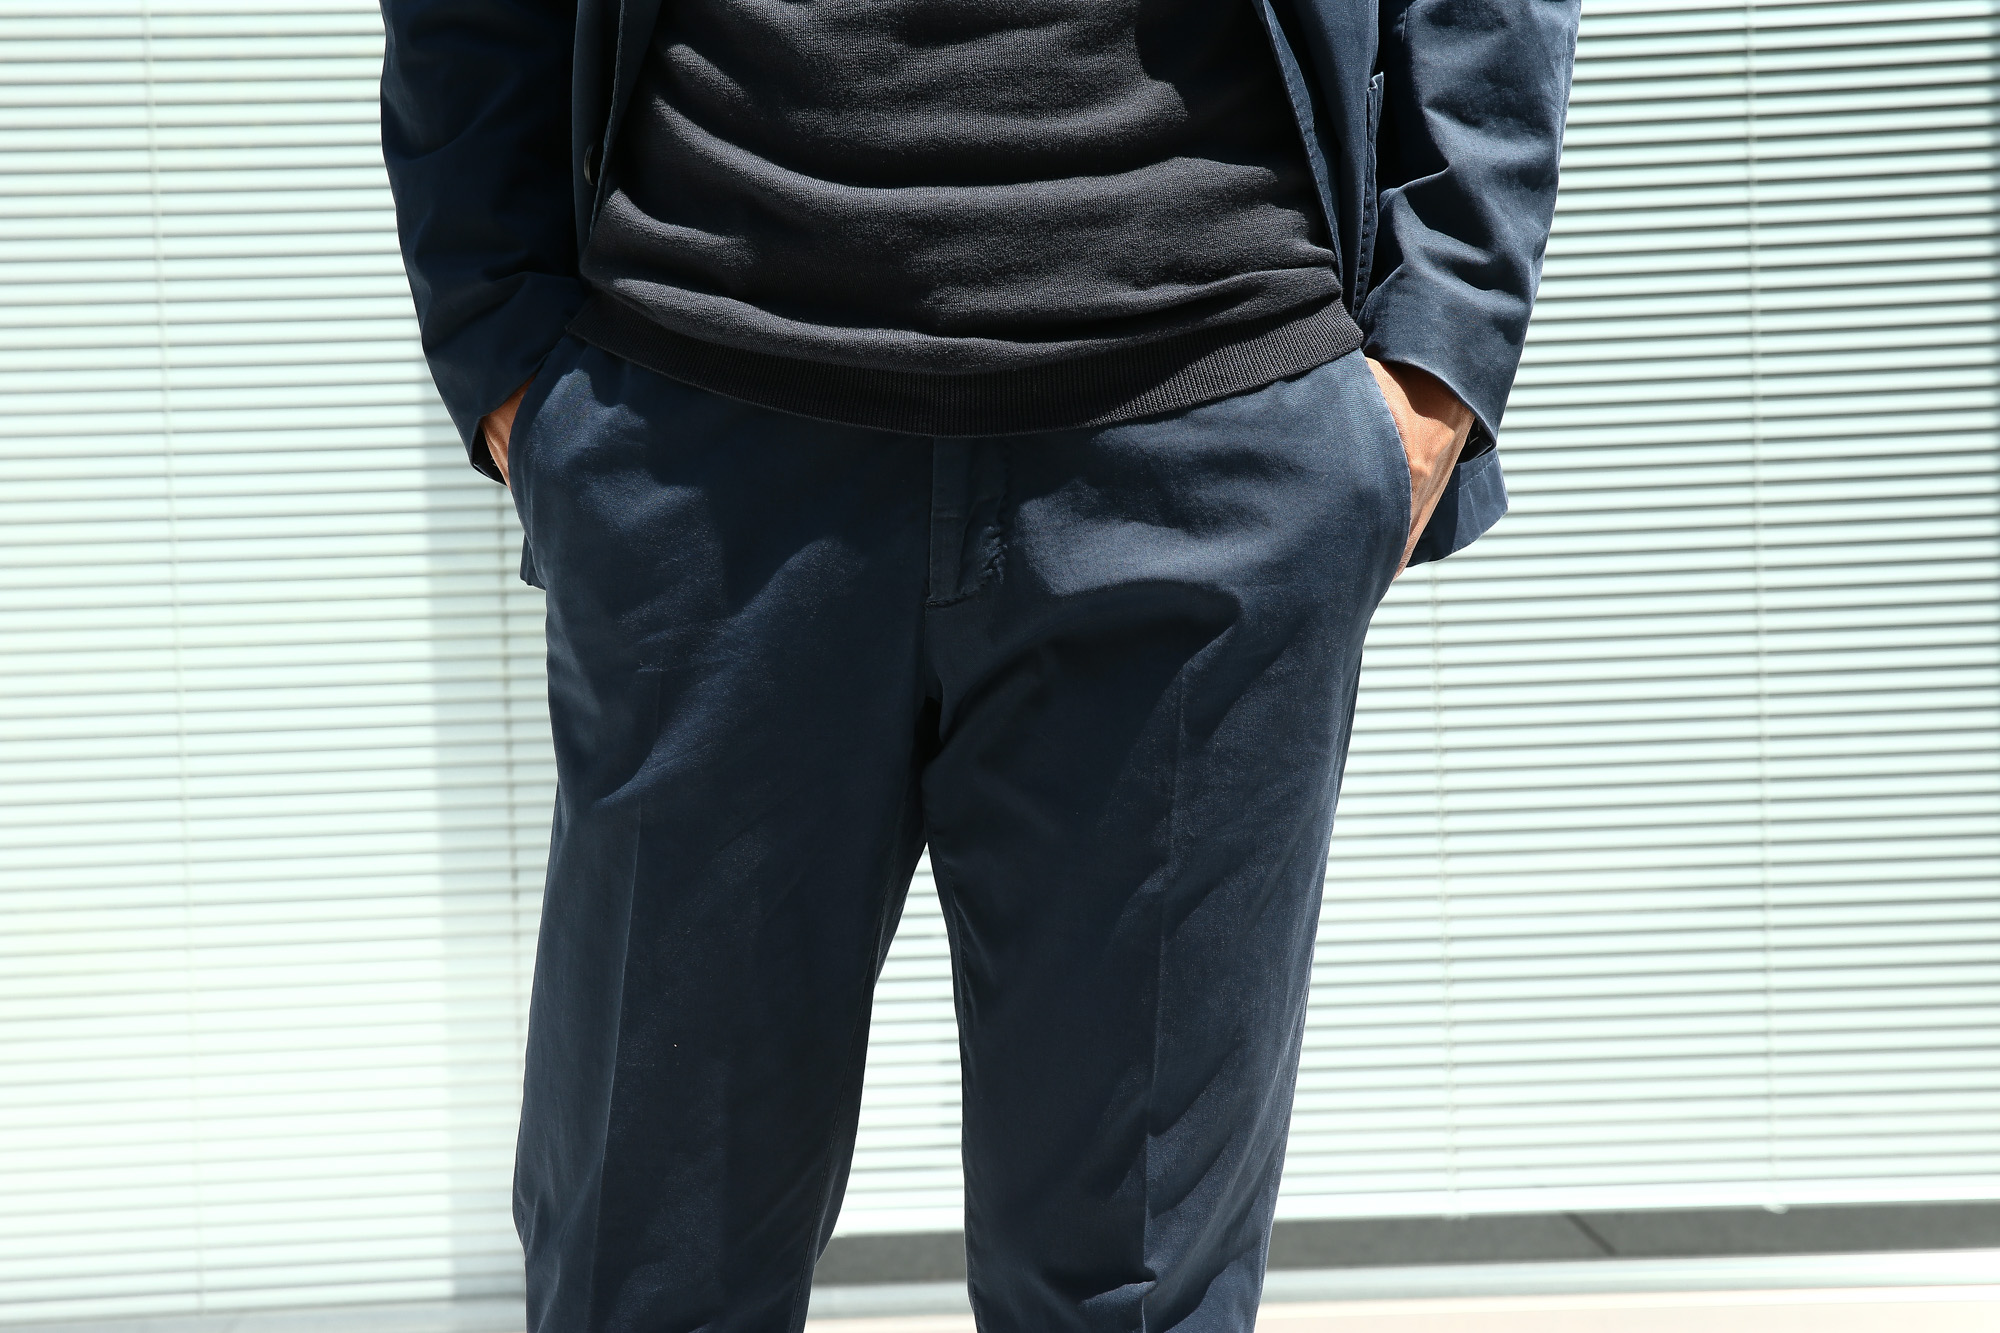 BOGLIOLI MILANO (ボリオリ ミラノ) K.JACKET (Kジャケット) ストレッチ コットン ツイル 3B スーツ NAVY (ネイビー・73) Made in italy (イタリア製) 2018 春夏新作 boglioli ボリオリ 愛知 名古屋 ZODIAC ゾディアック alto e diritto アルトエデリット